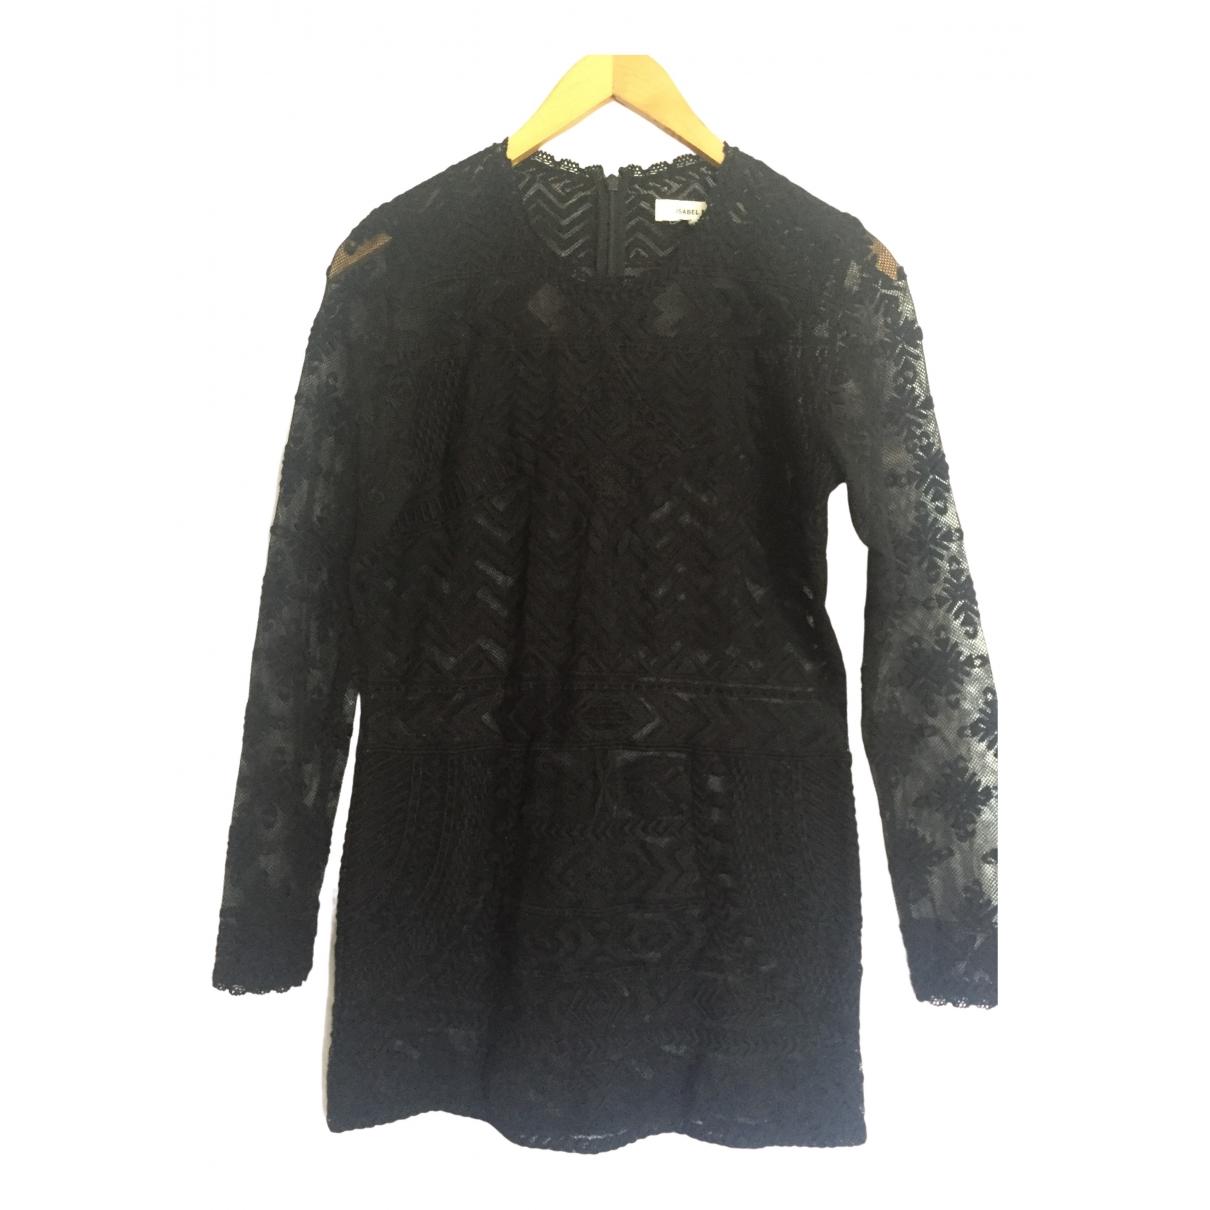 Isabel Marant Pour H&m \N Black Cotton  top for Women S International